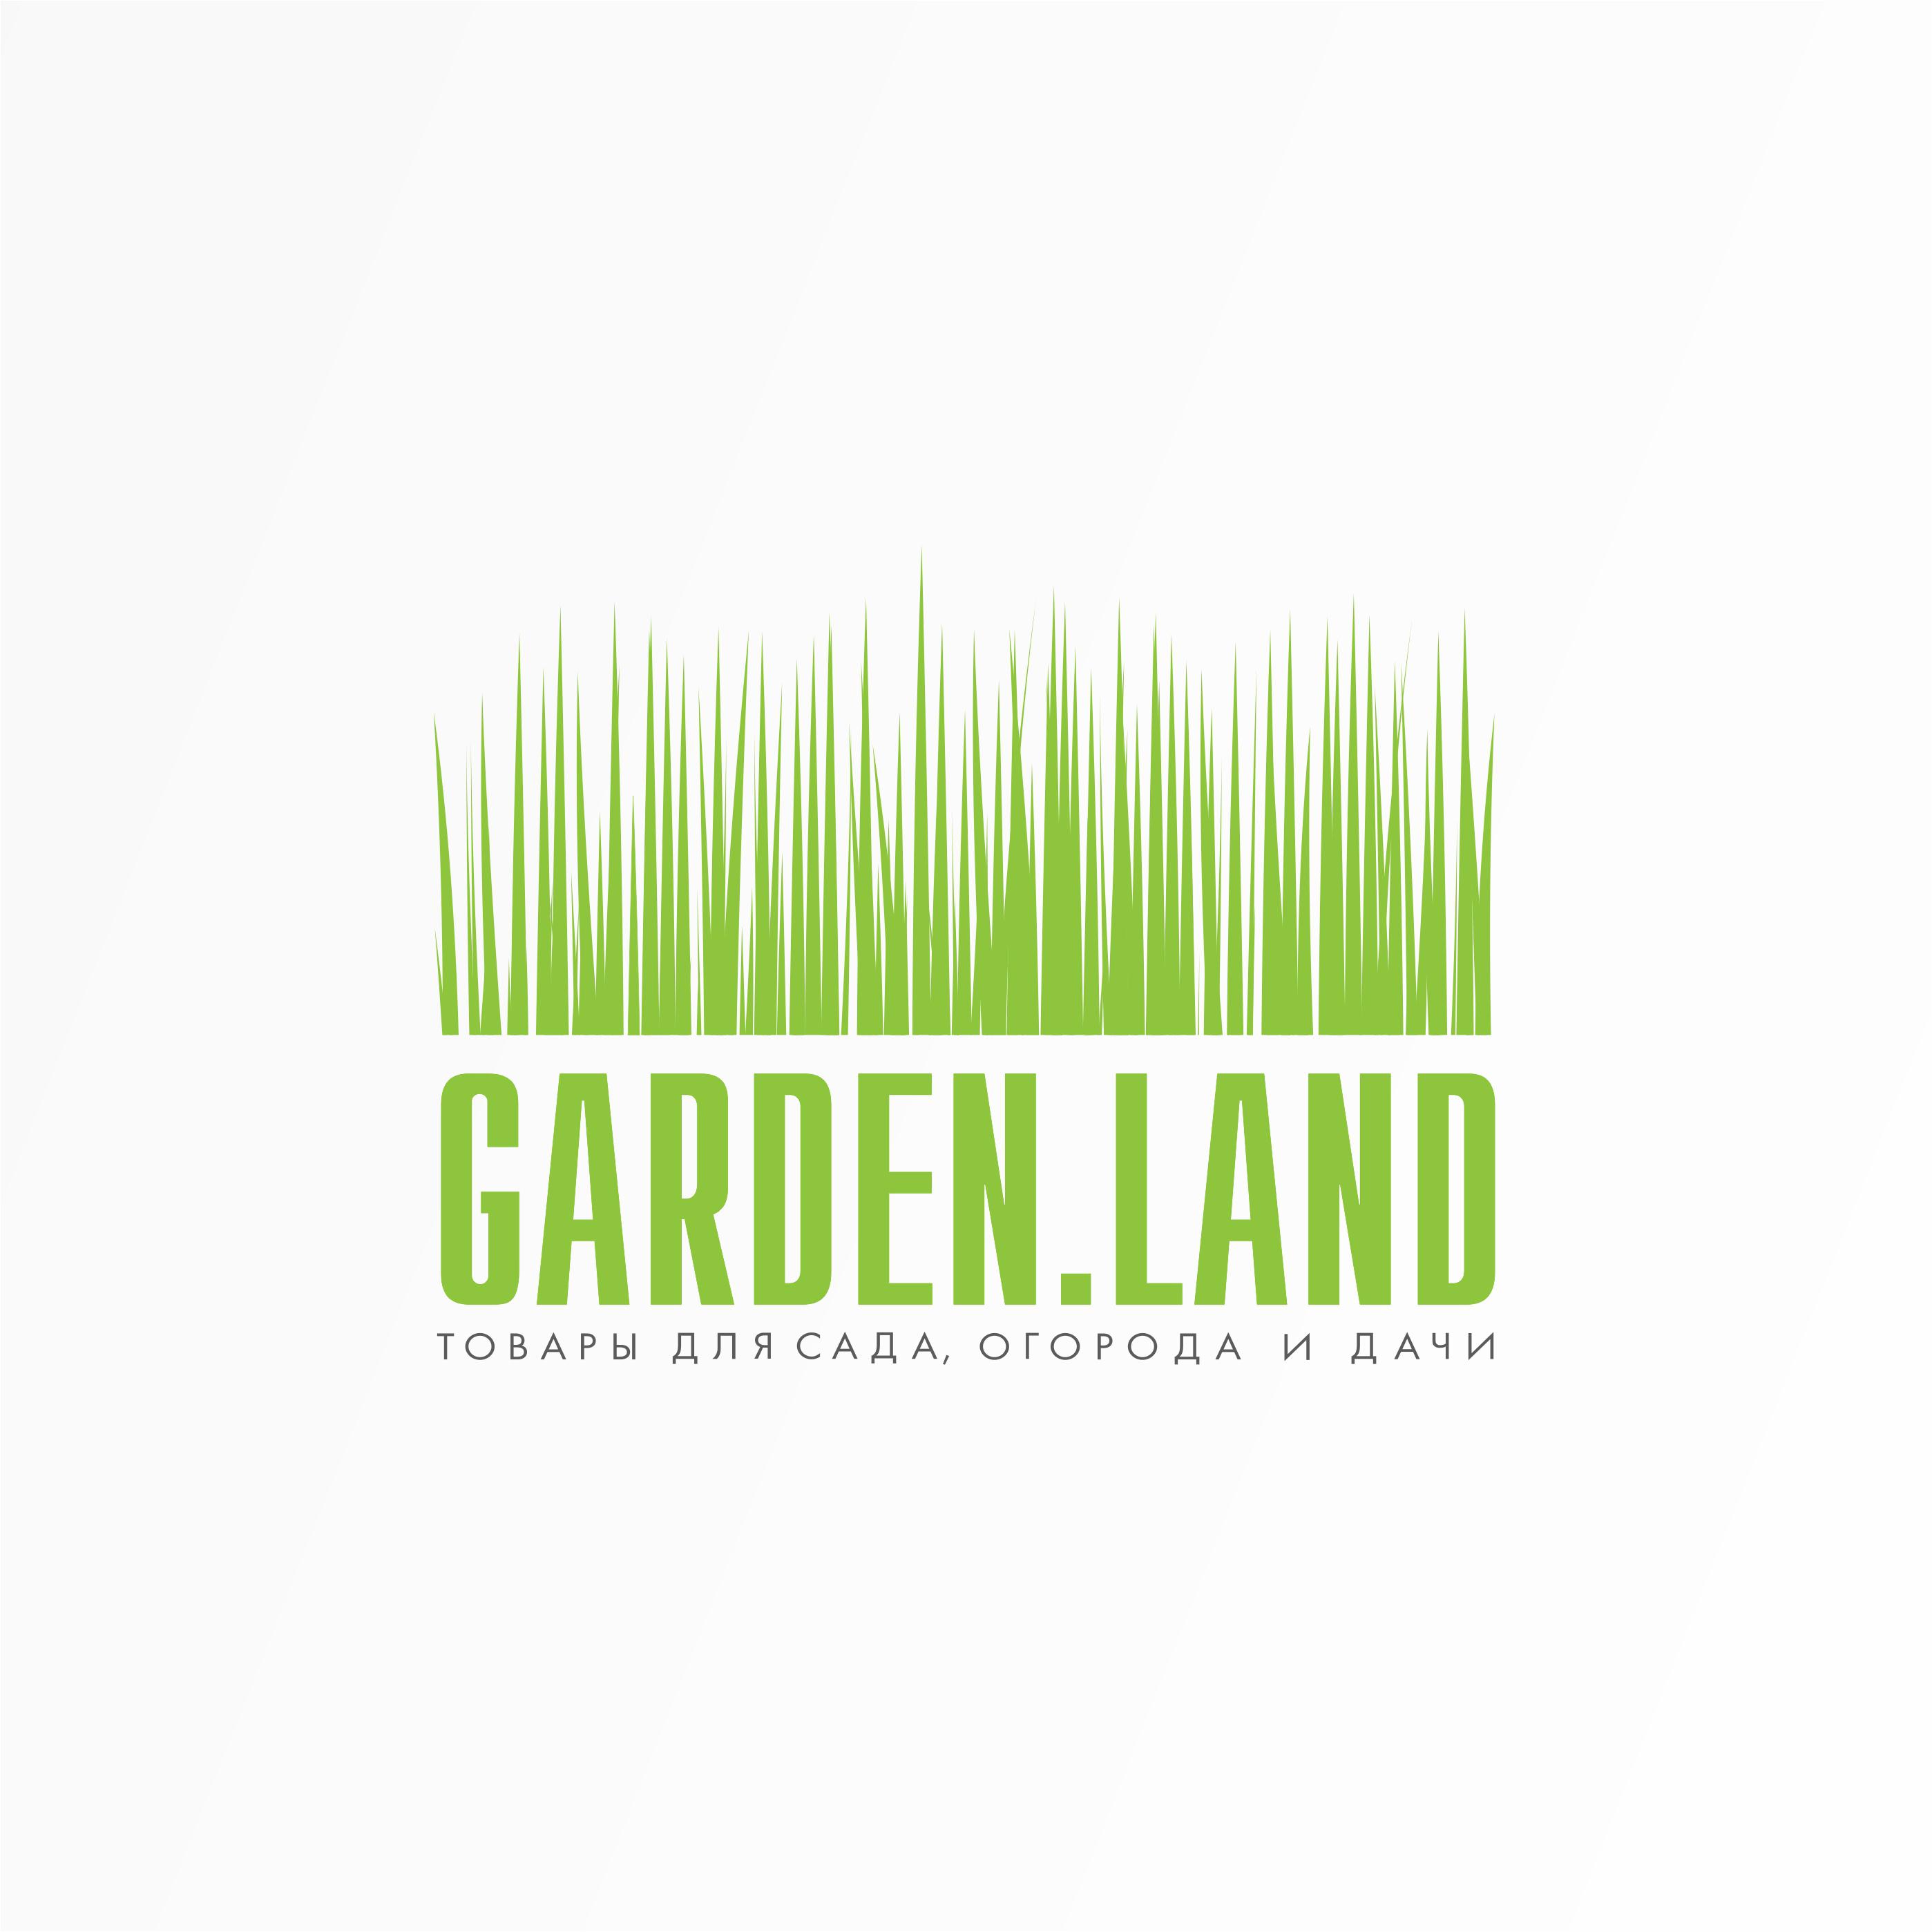 Создание логотипа компании Garden.Land фото f_7855986e7963d15f.jpg